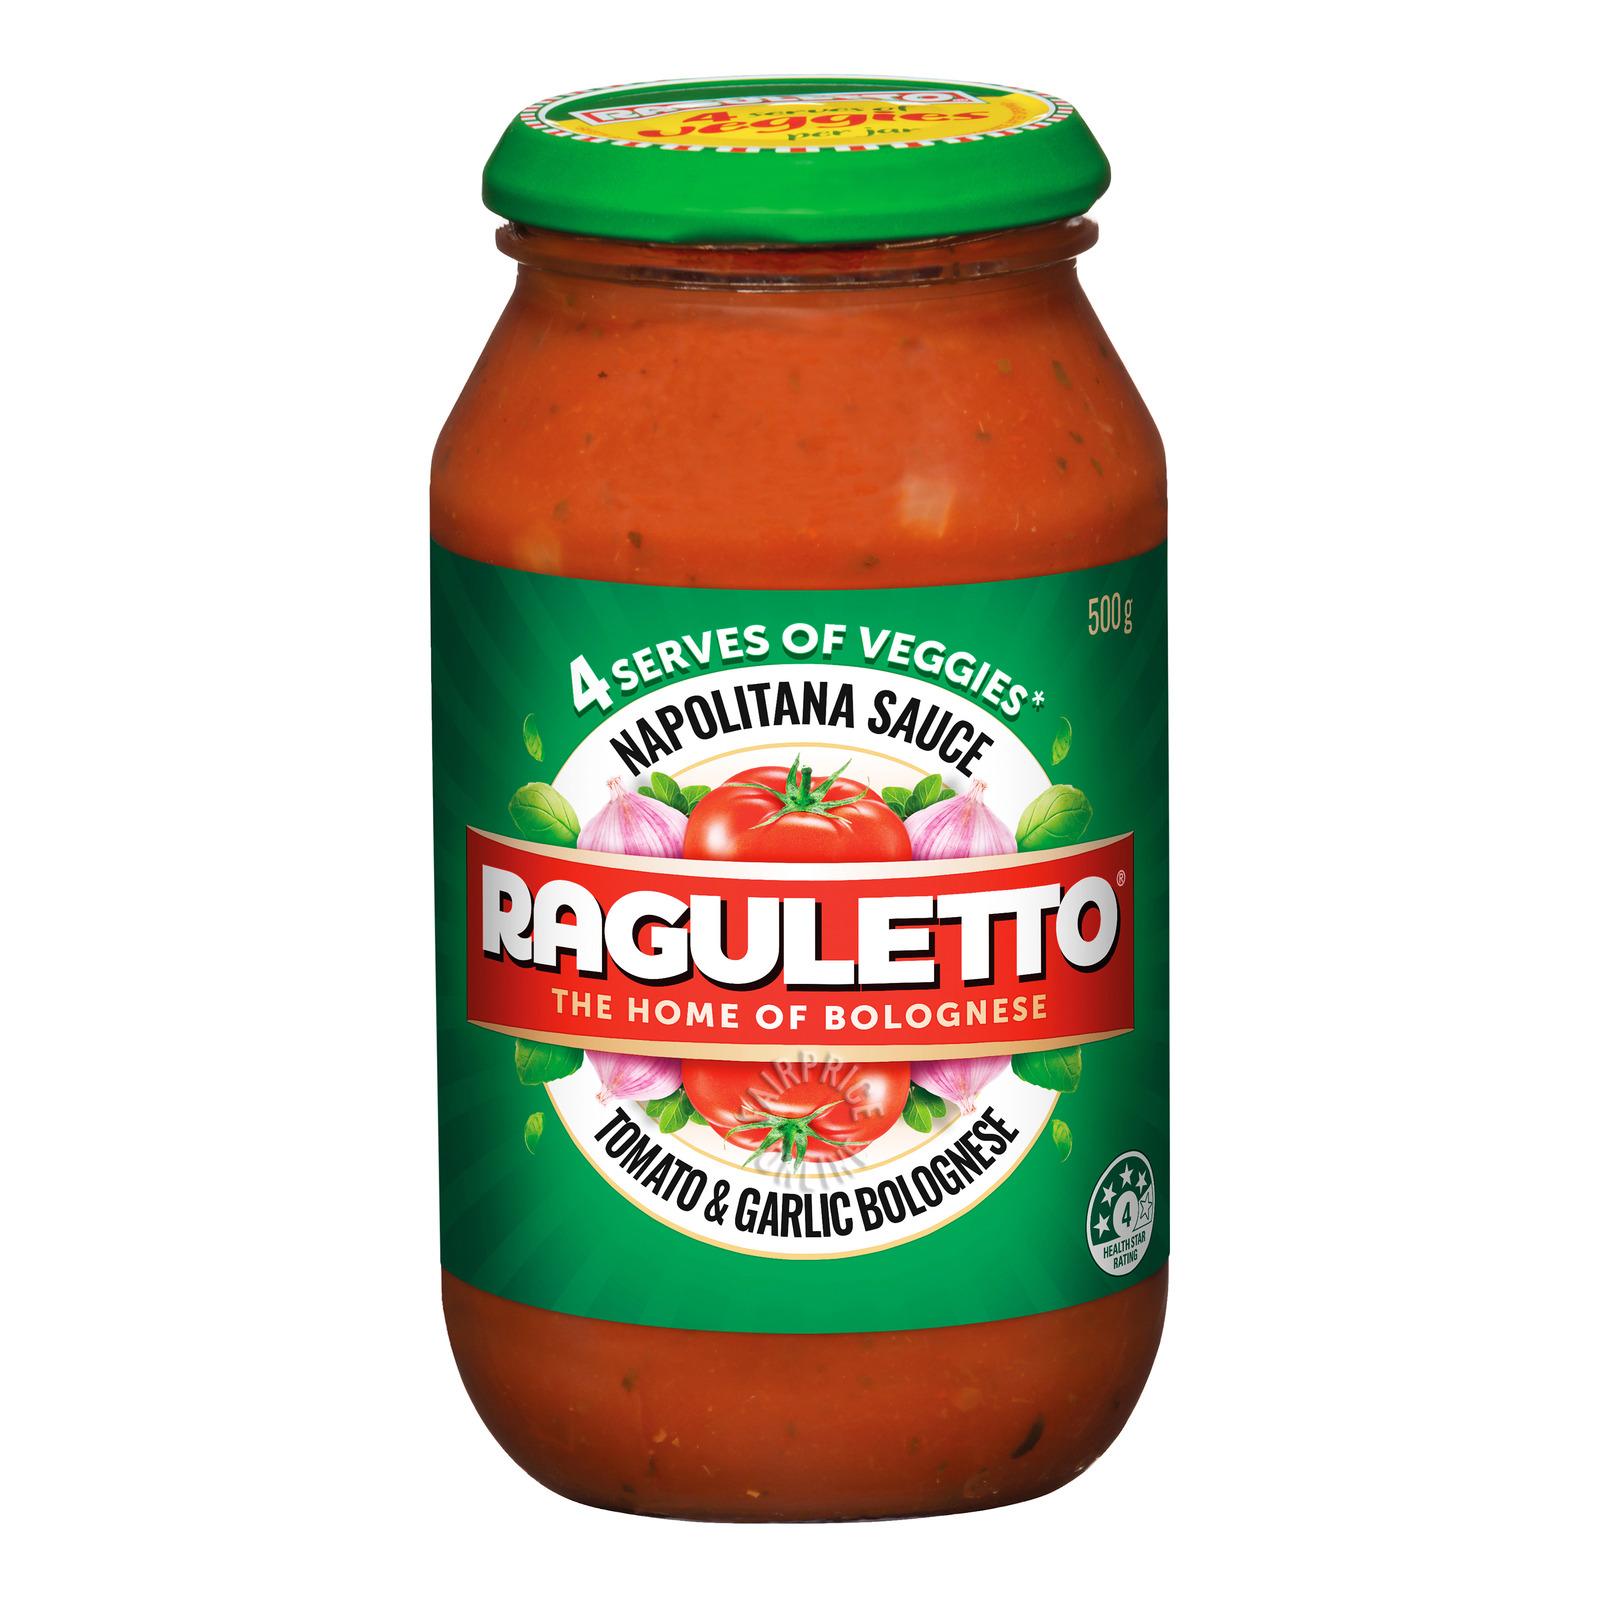 Raguletto Napolitana Pasta Sauce - Tomato & Garlic